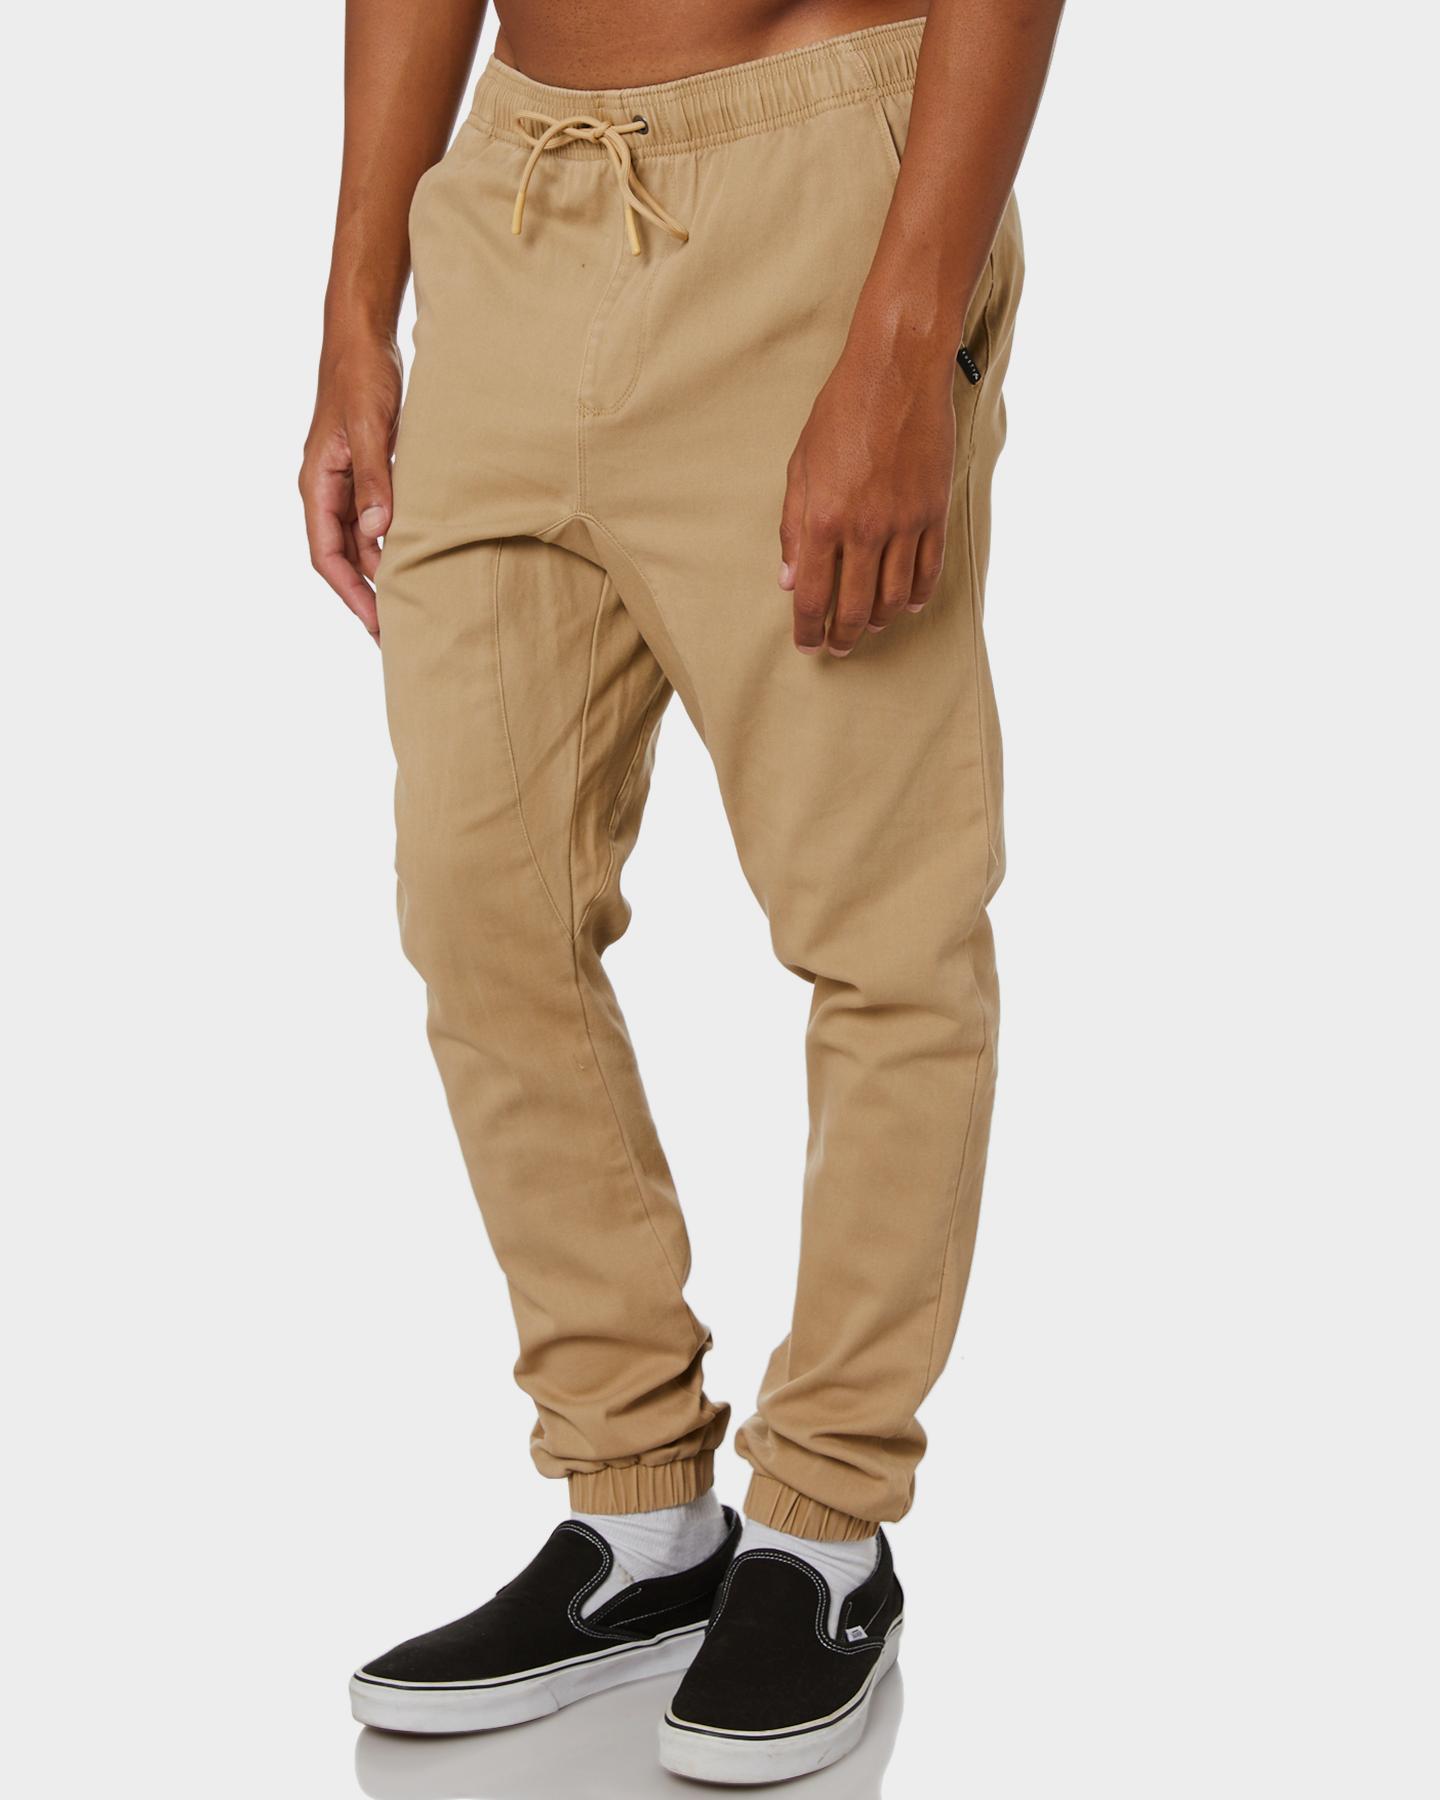 New-Rusty-Men-039-s-Hook-Out-Mens-Jogger-Pant-Cotton-Spandex-Blue thumbnail 17